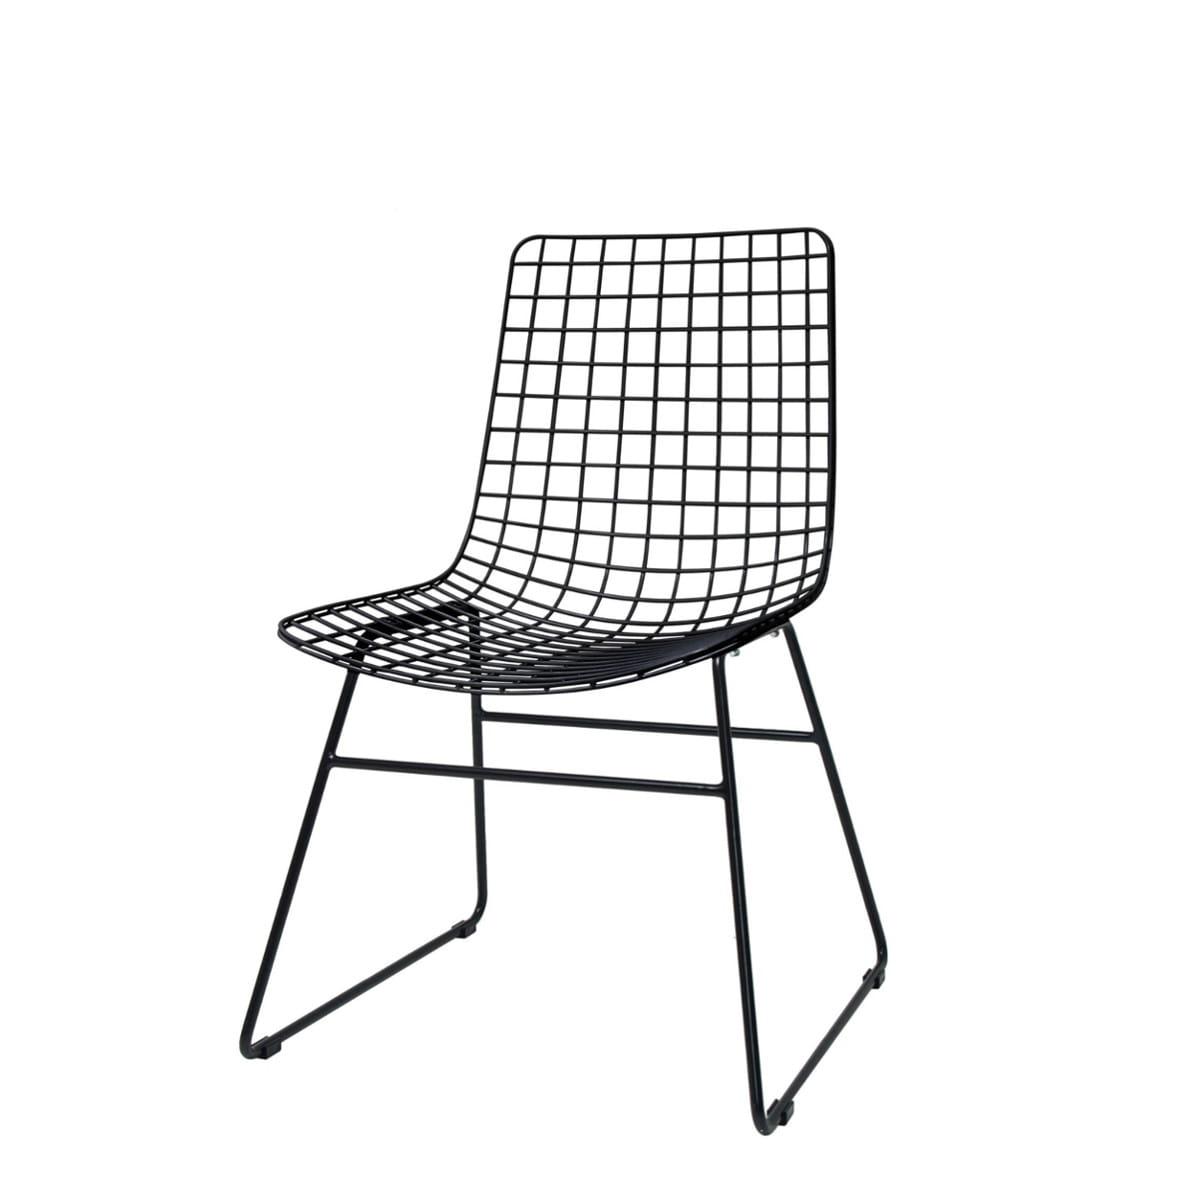 Krzesło Metalowe Wire Czarne Hk Living Nordic Decoration Home